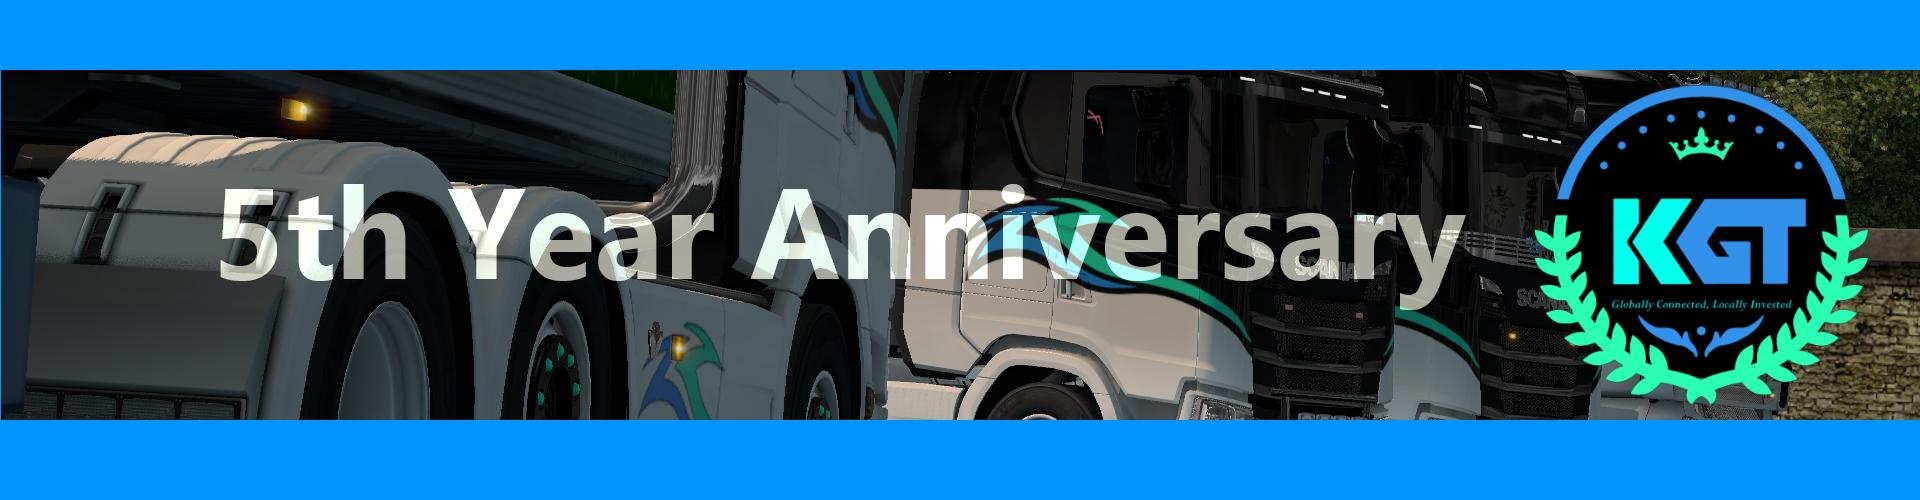 Kings Global Transport - 5th Year Anniversary